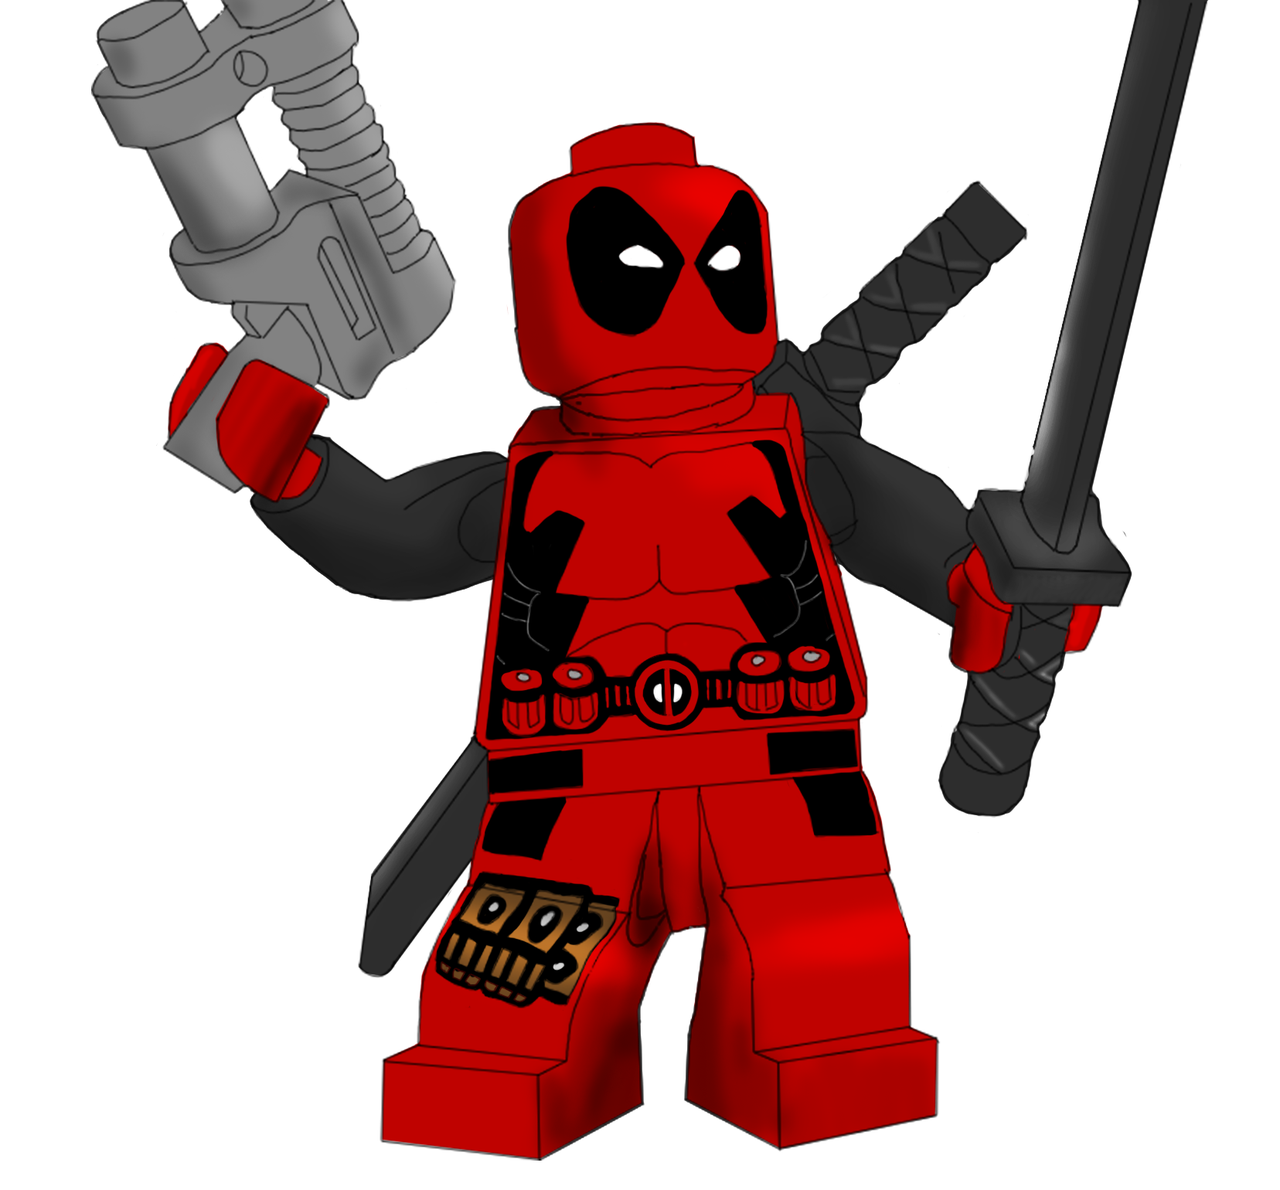 deadpool at JesterGoblin |Lego Marvel Superheroes Deadpool Set